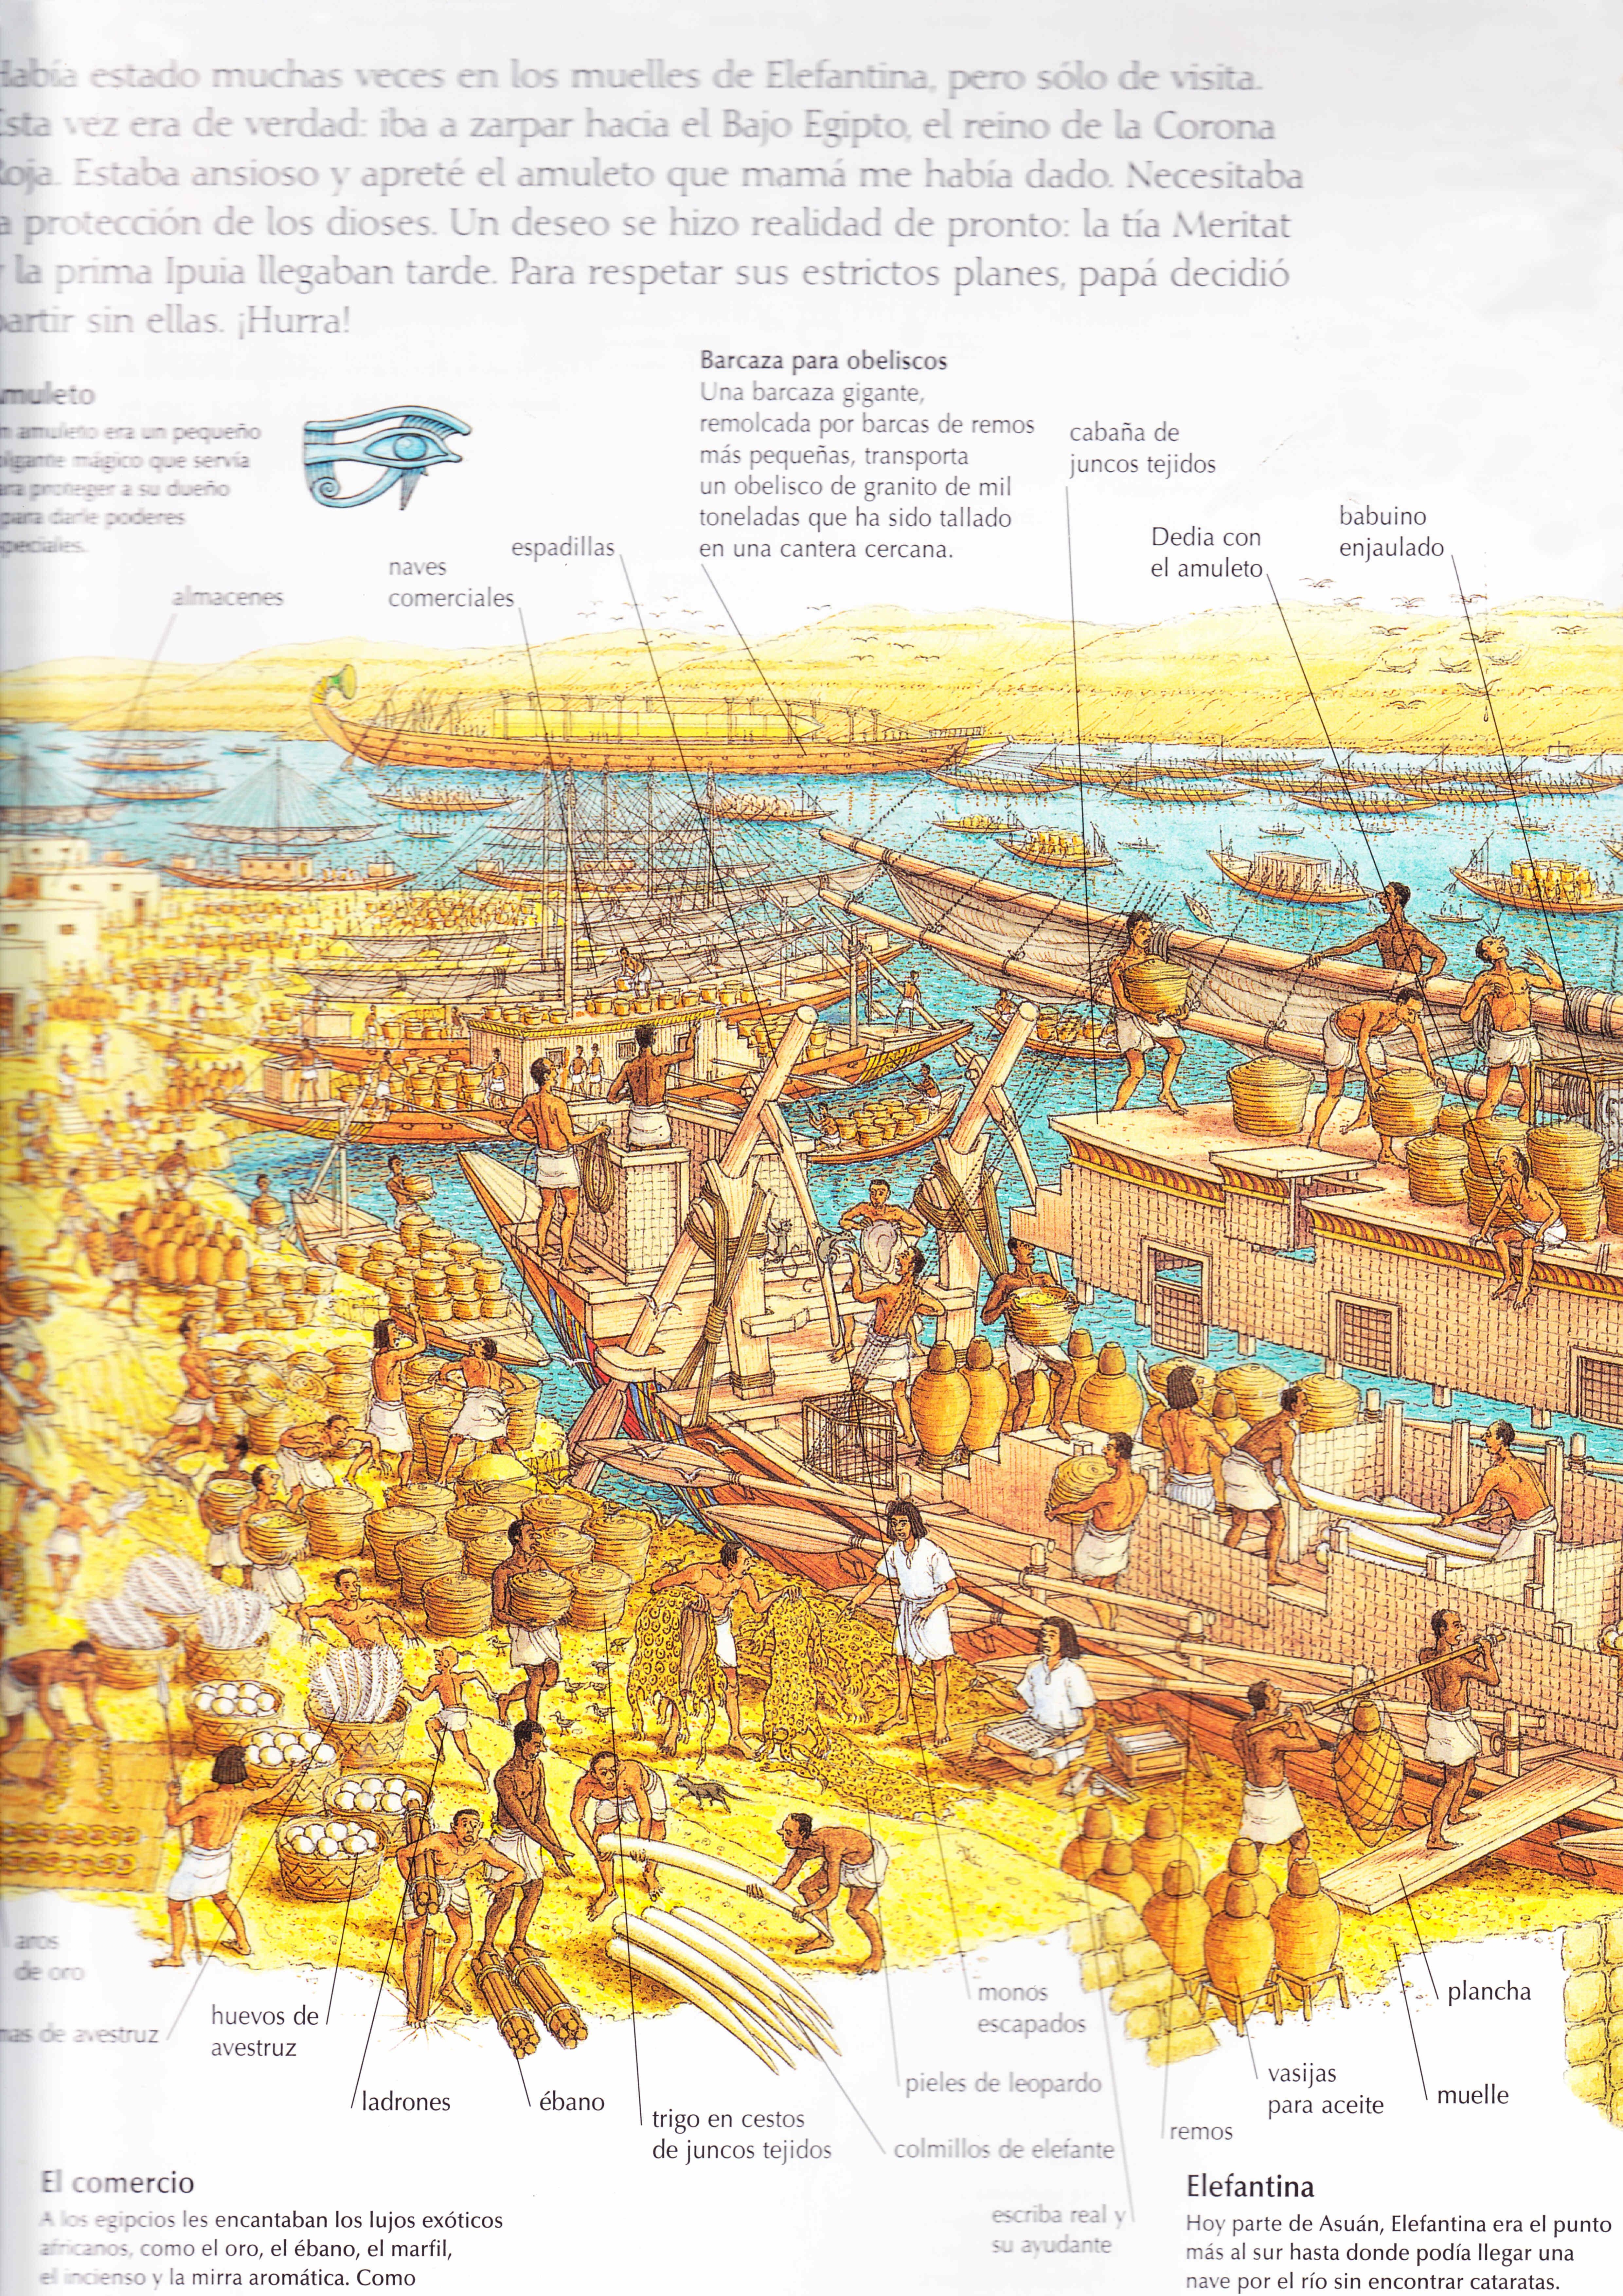 Egipto antiguo 29 y Ptolomeo III Evergetes 5